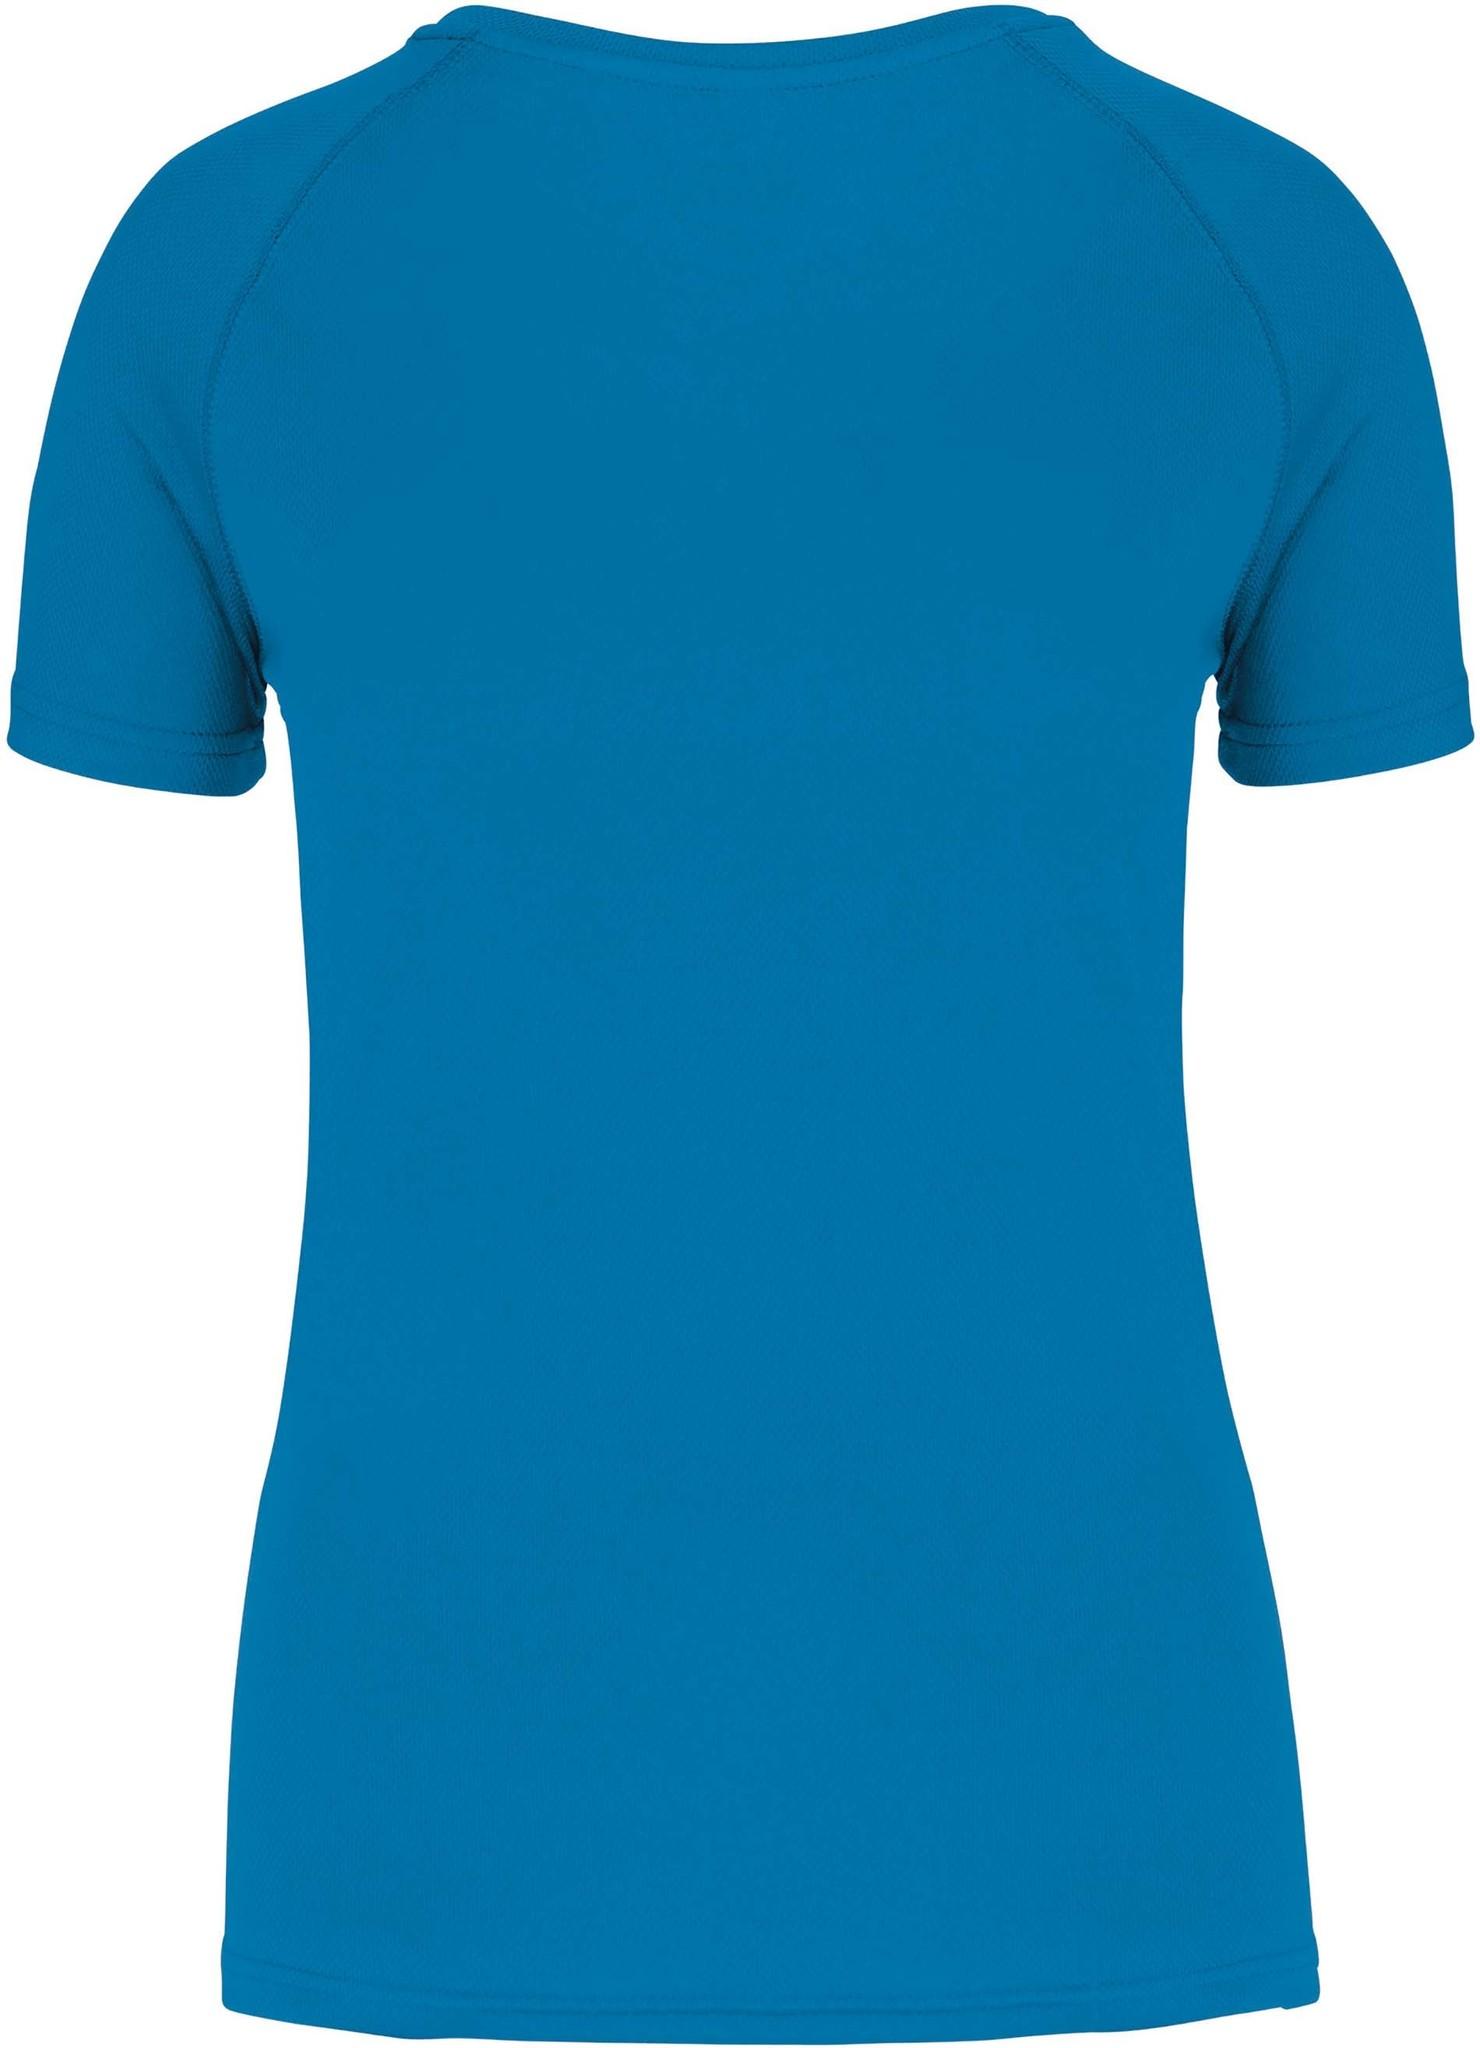 Gerecycled damessport-T-shirt met ronde hals-Aquablue